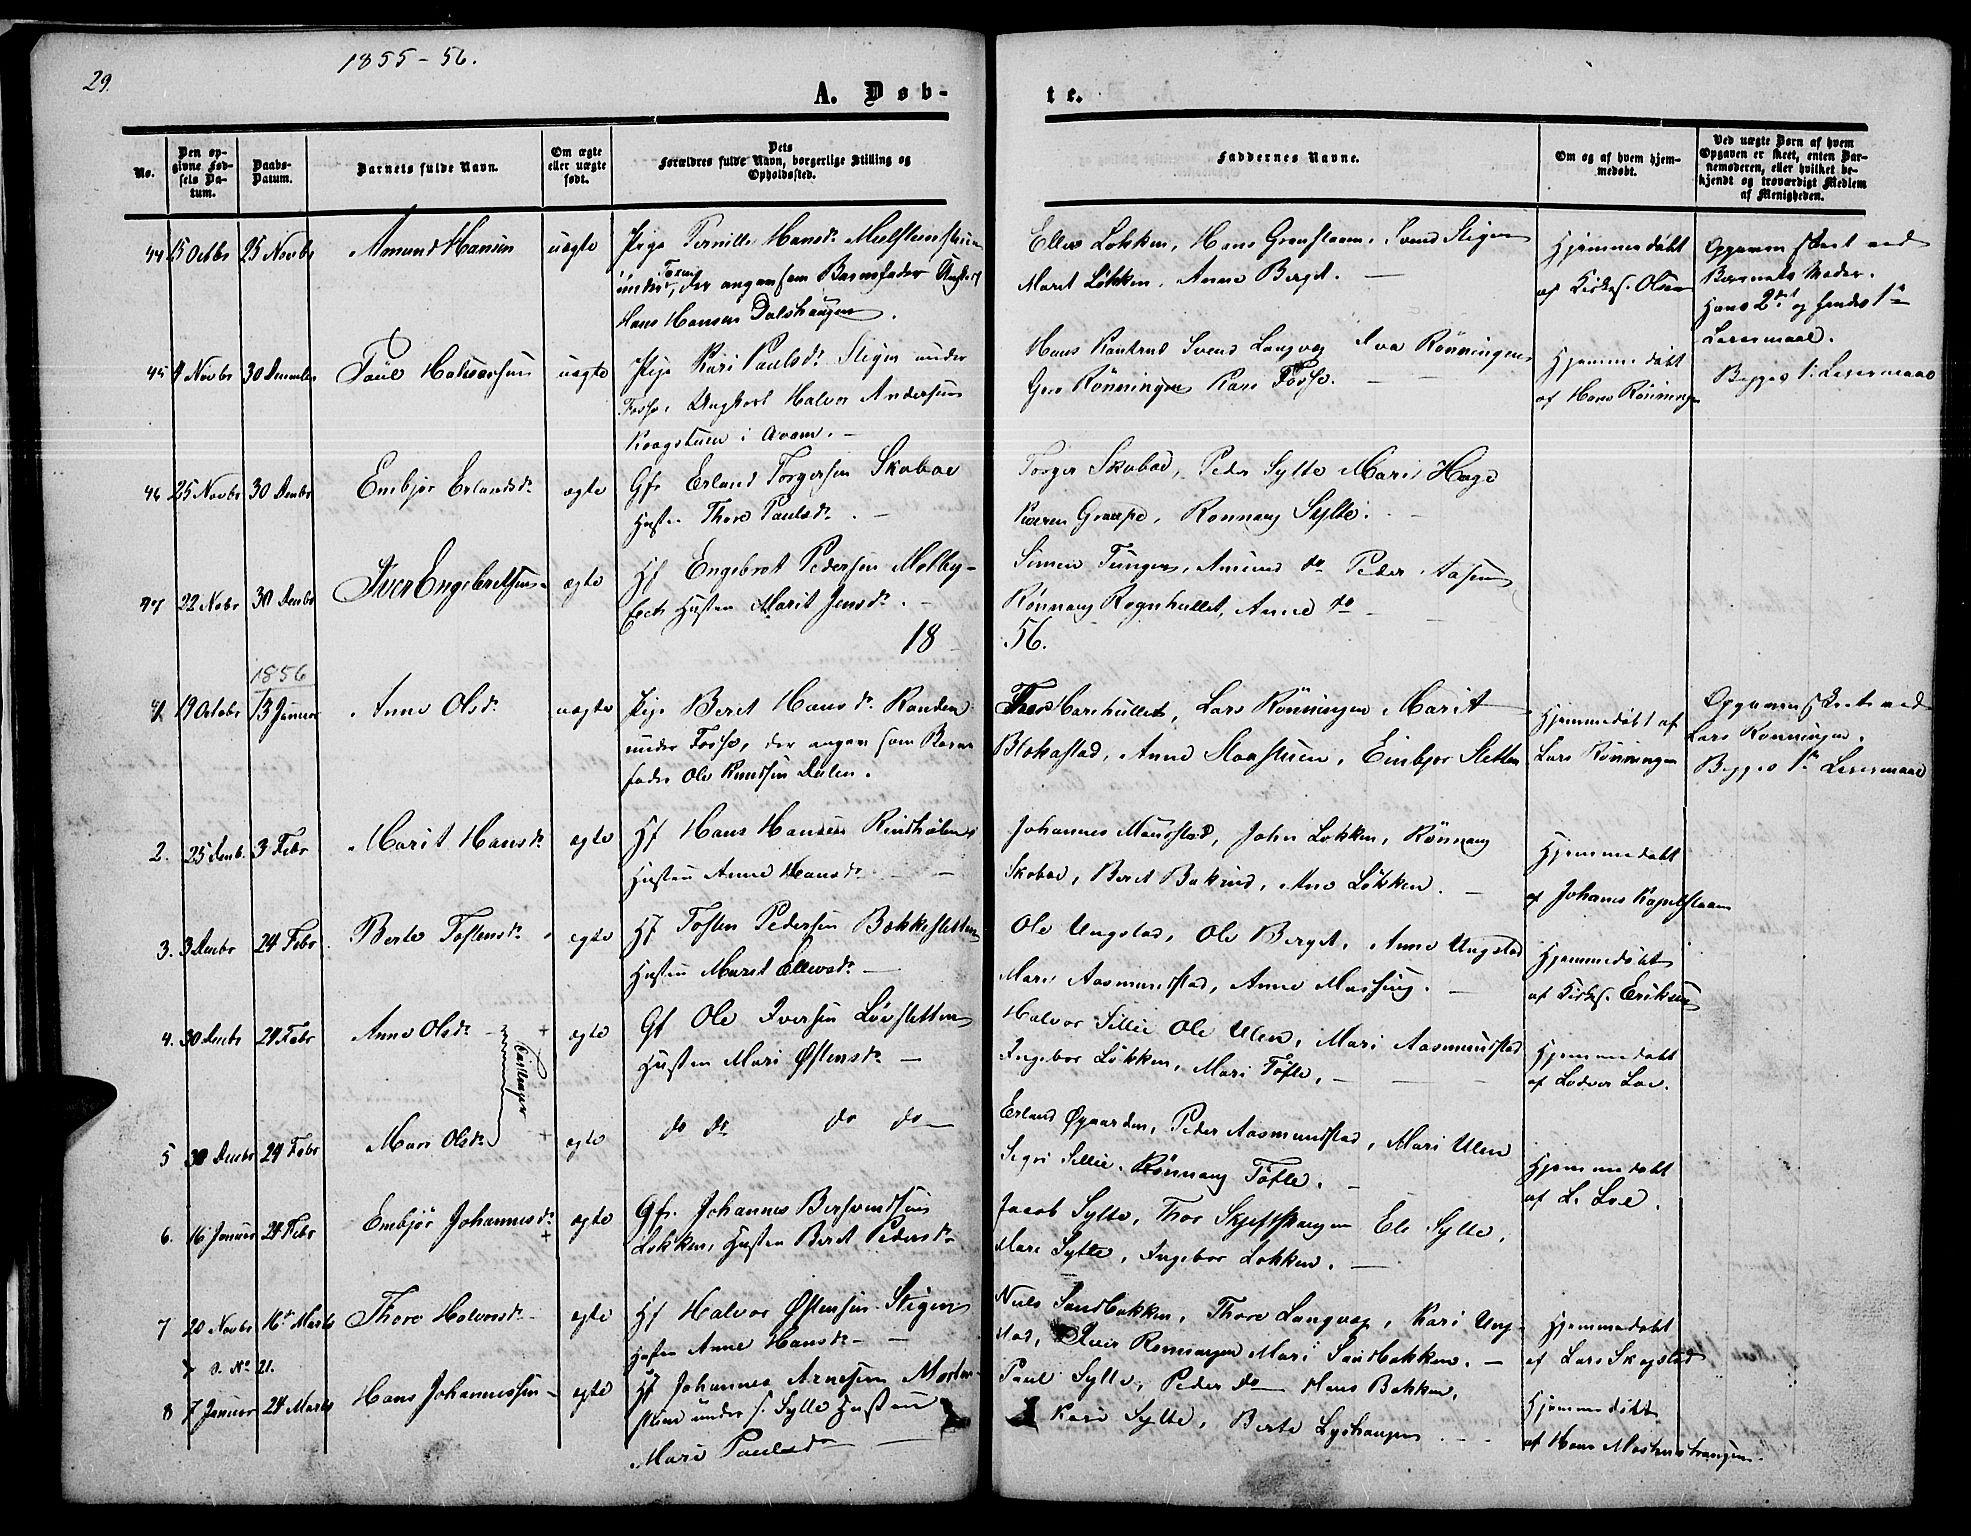 SAH, Nord-Fron prestekontor, Klokkerbok nr. 2, 1851-1883, s. 29